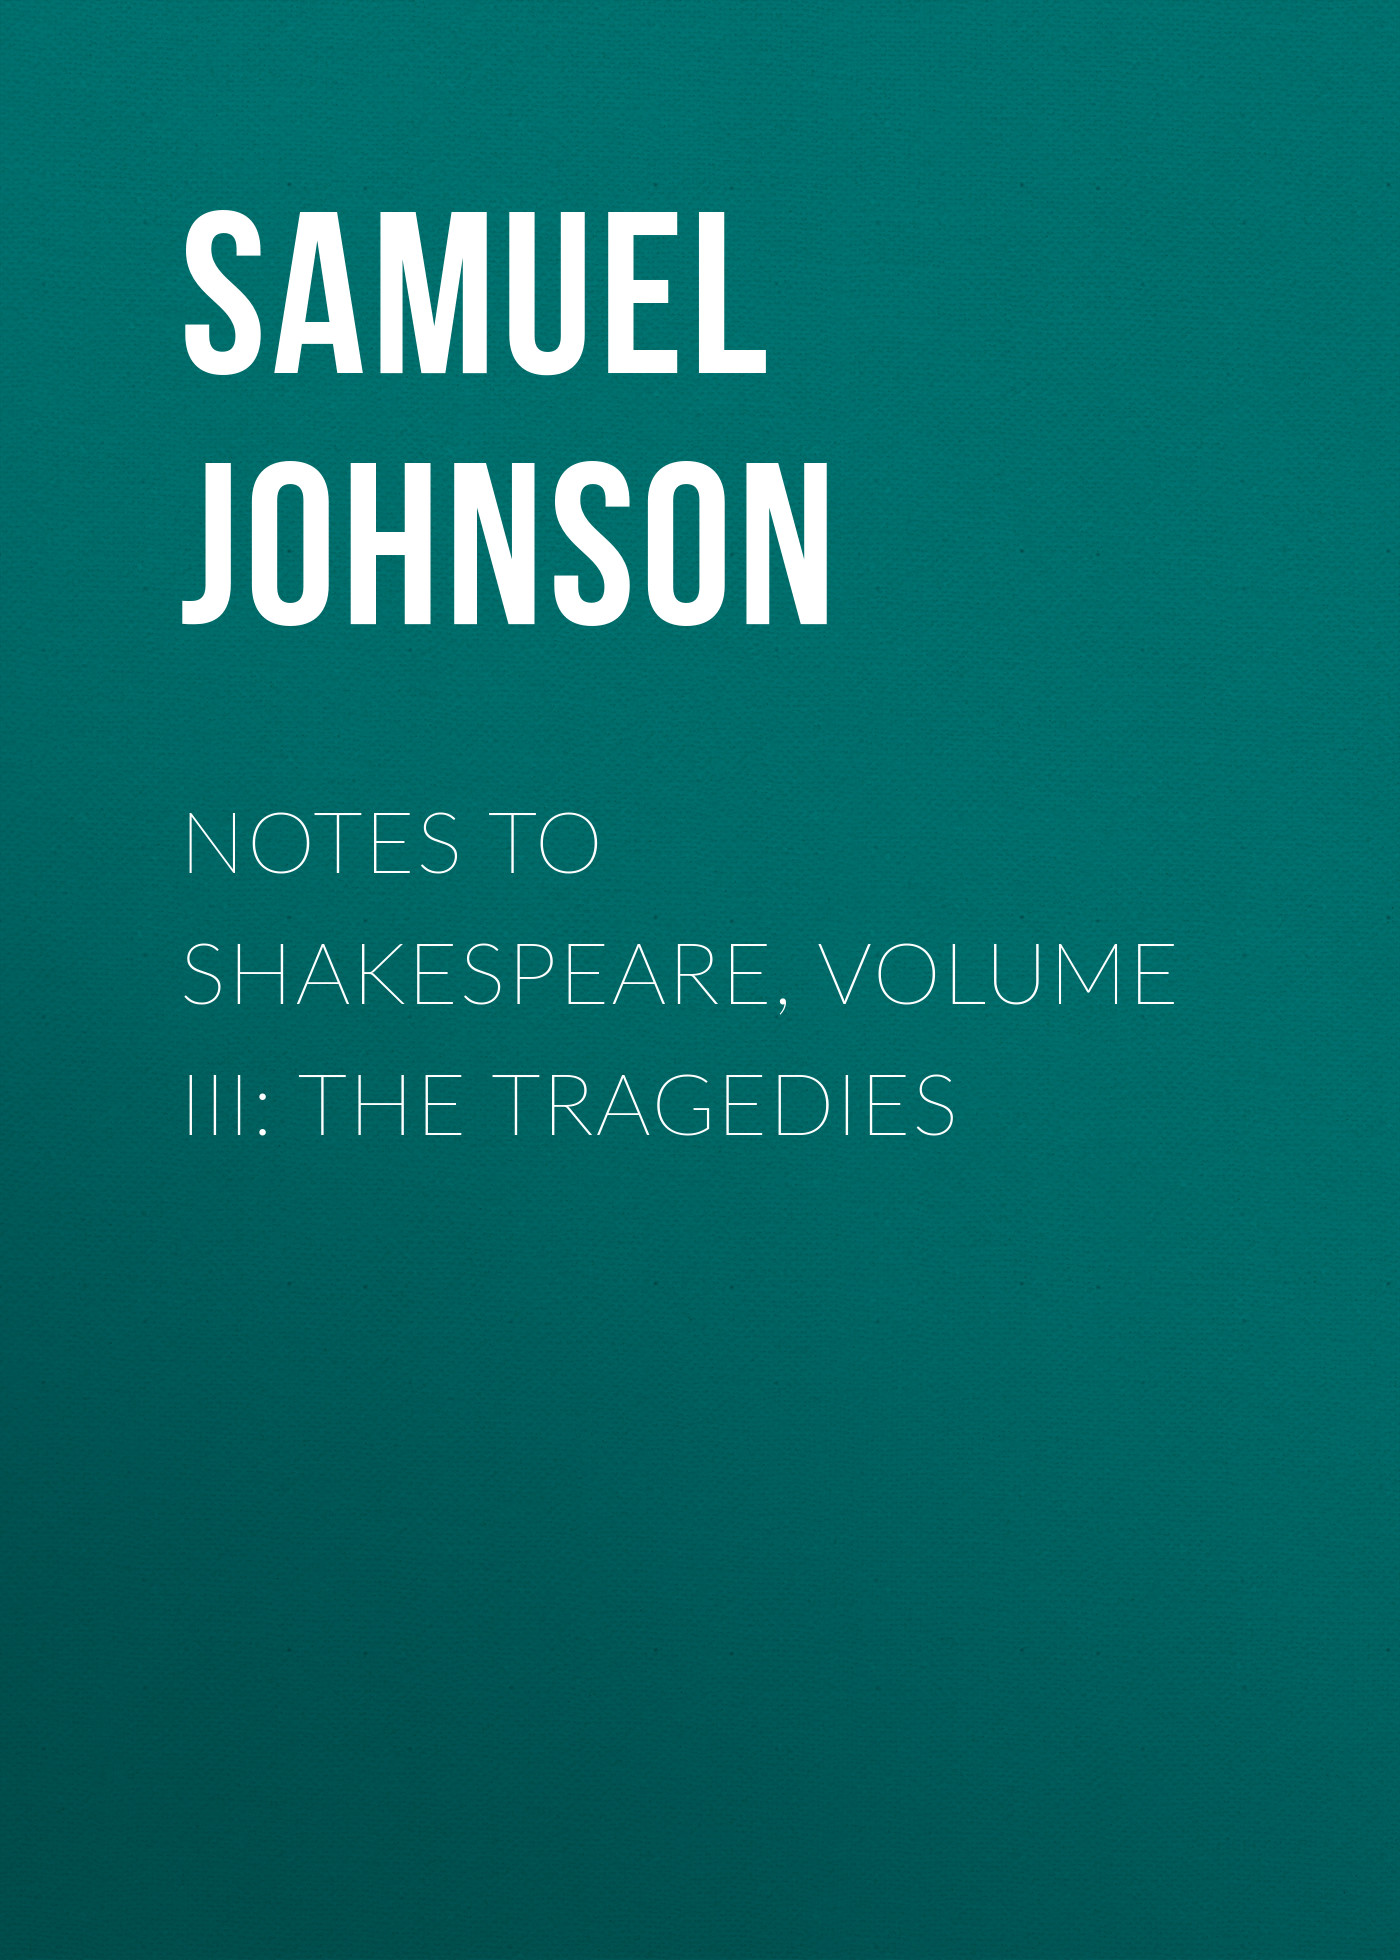 Samuel Johnson Notes to Shakespeare, Volume III: The Tragedies various shakespeare songs morley weelkes johnson byrd deller consort a deller 1